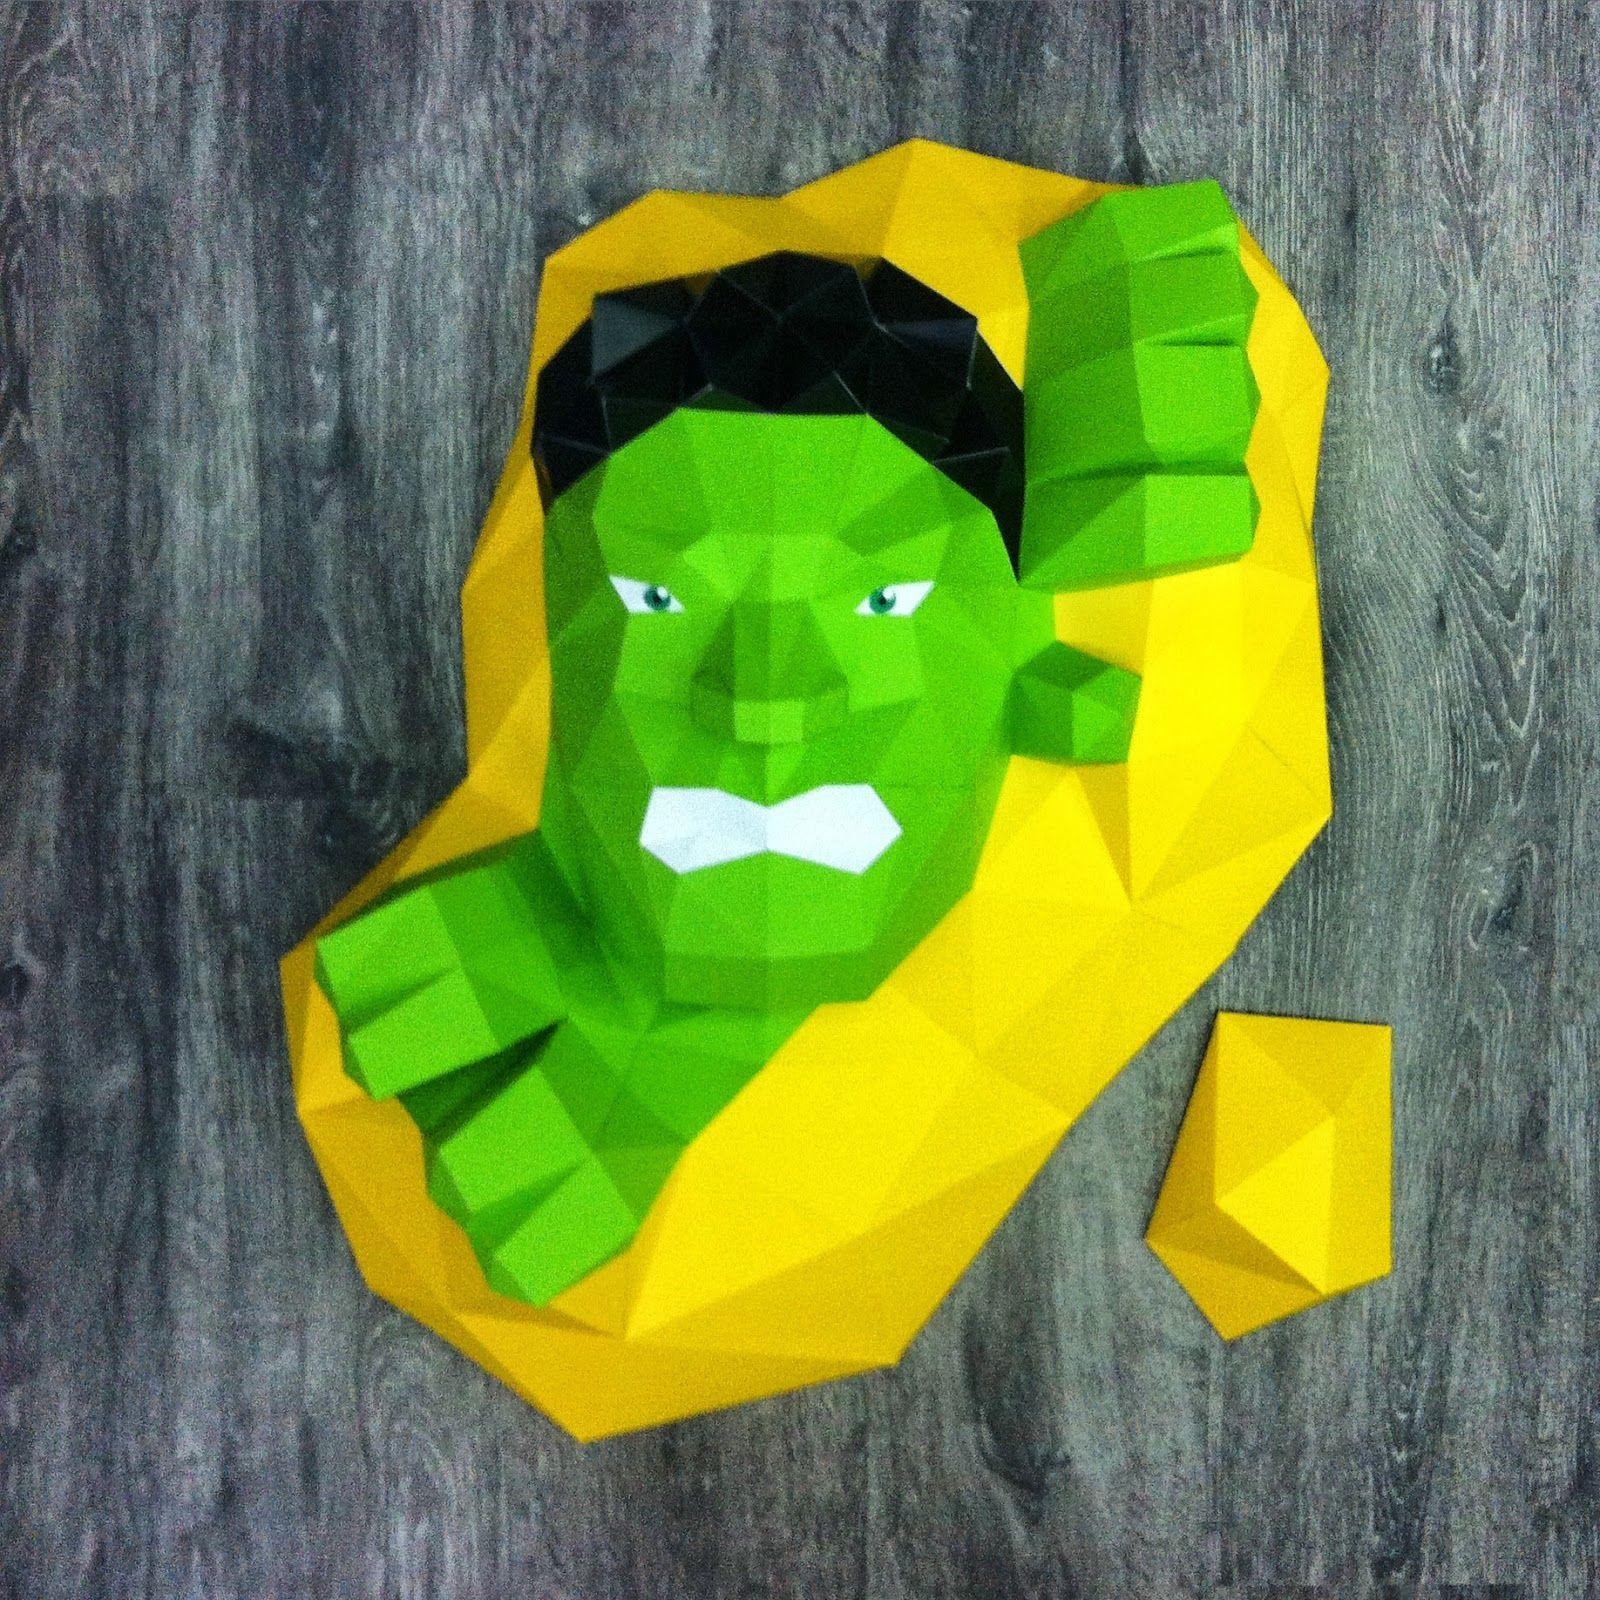 Sculpture Hulk en papier - Paper Hulk Sculpture #paper #papier #papercut #papercut #pepakura #sculpture #design #vector #hulk #thehulk #theincrediblehulk #incrediblehulk #hulksmash #marvel #avengers #theavengers